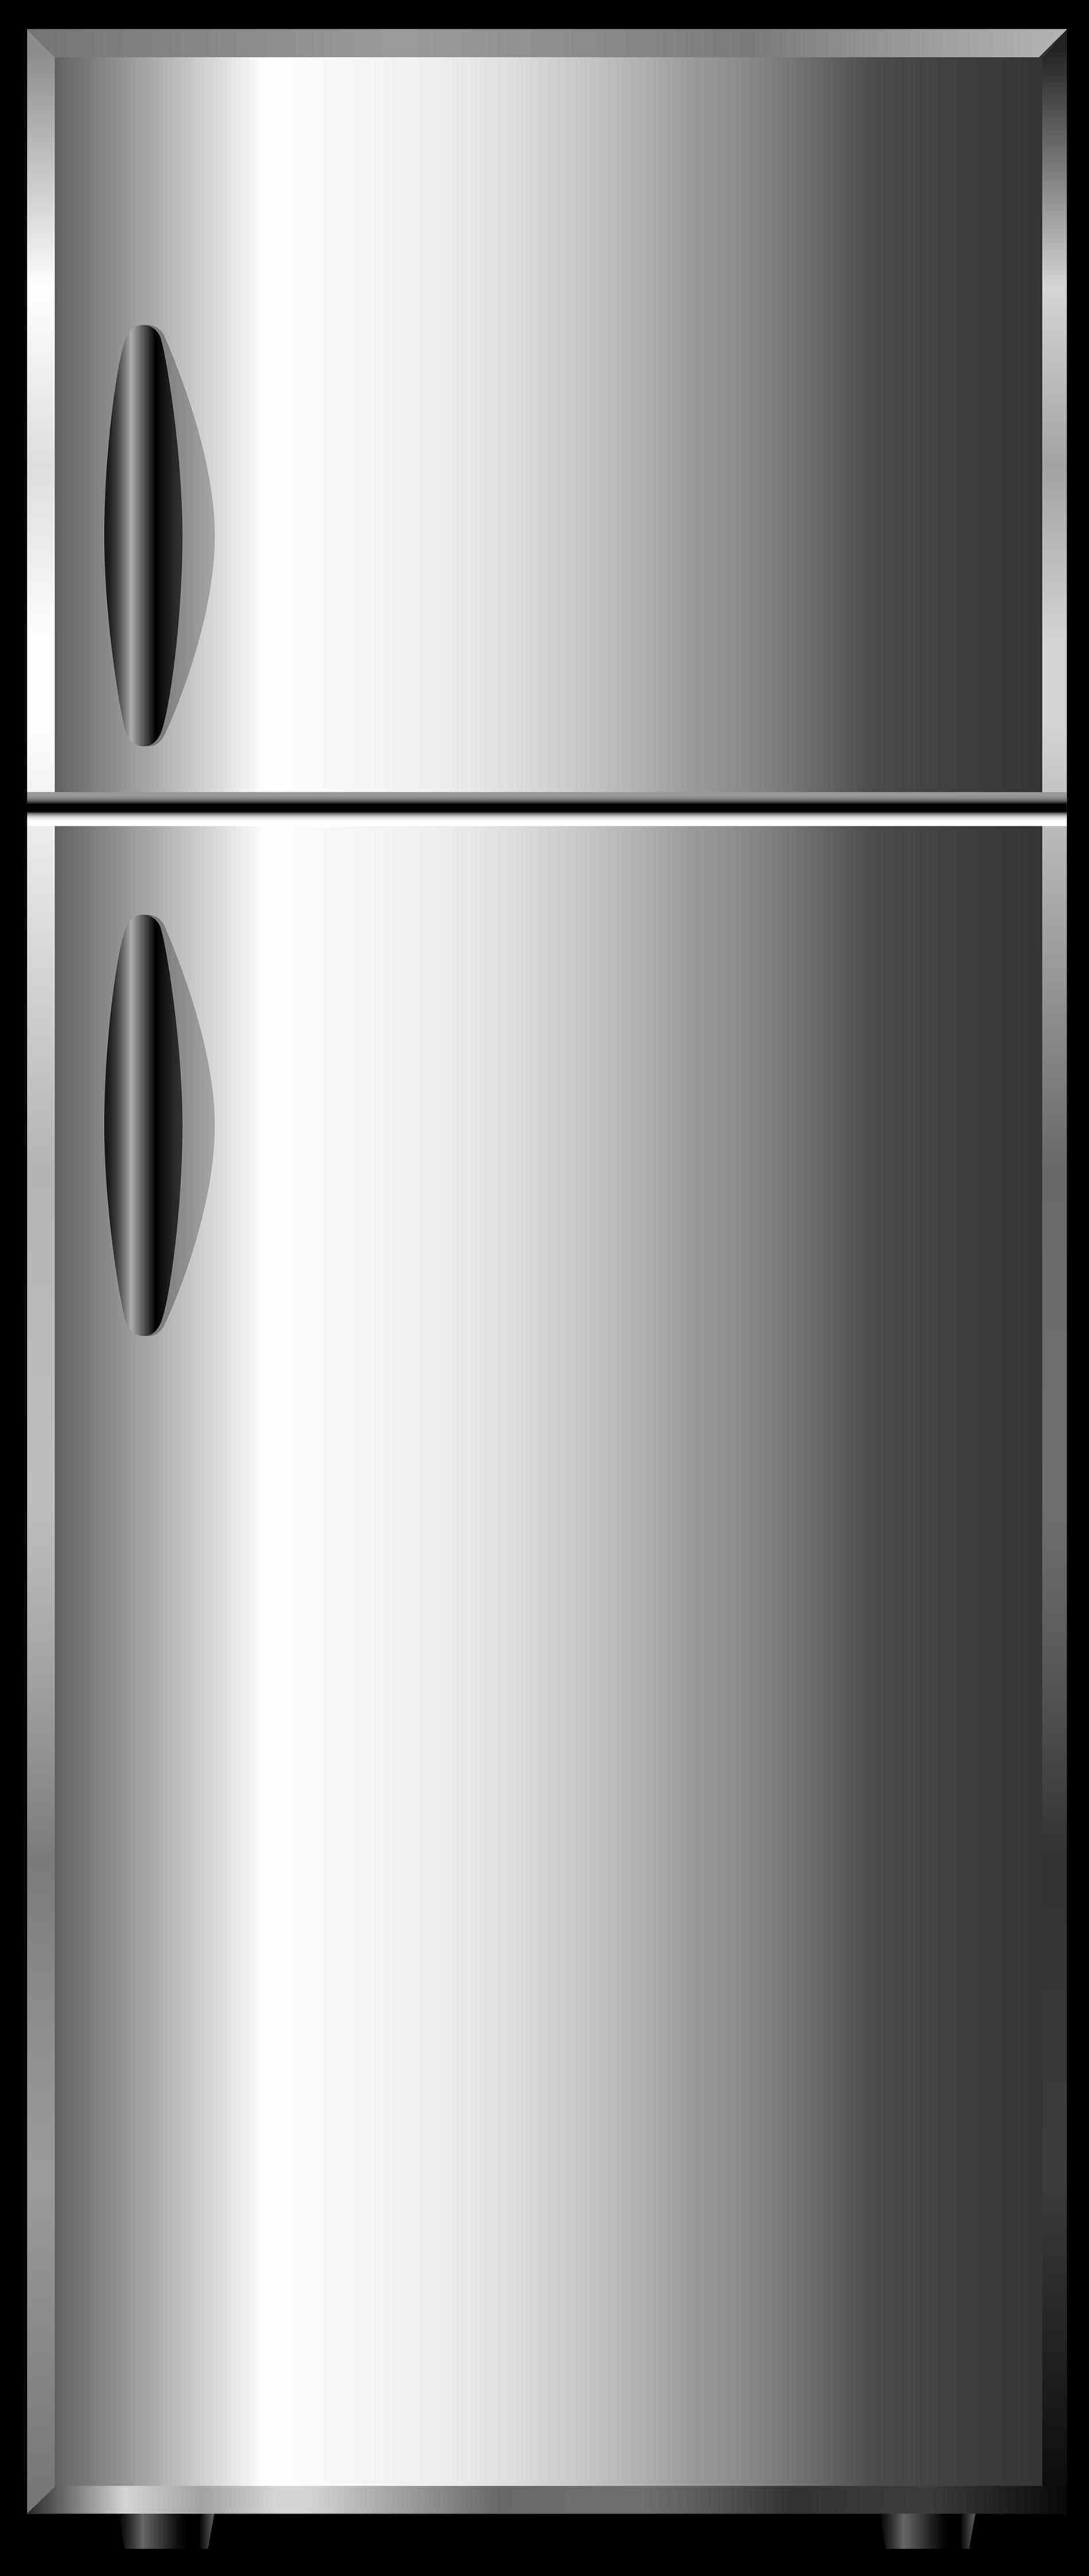 Fridge clipart fride. Art vector illustration grey